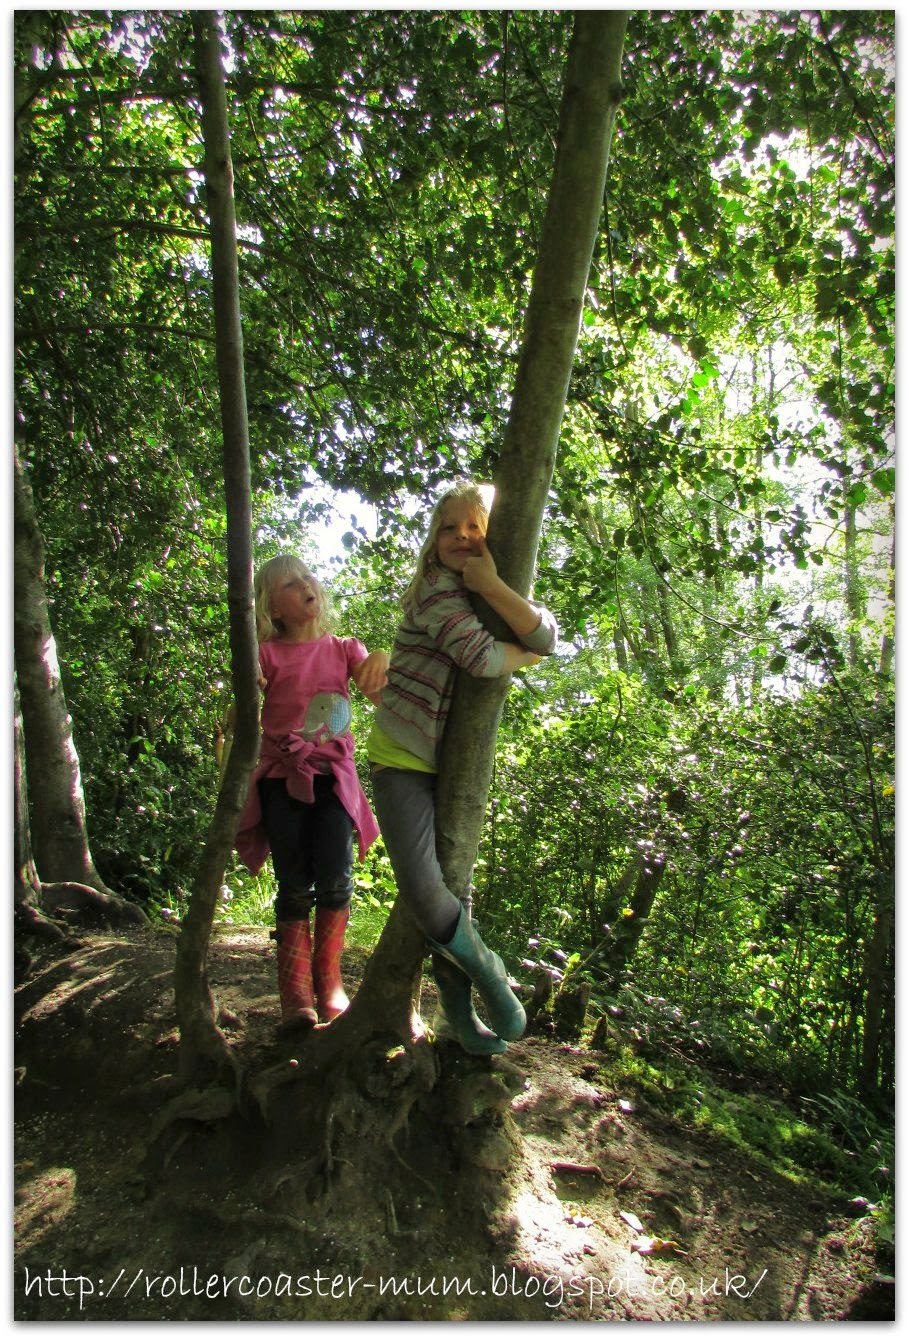 hugging a tree, Pooh Bridge